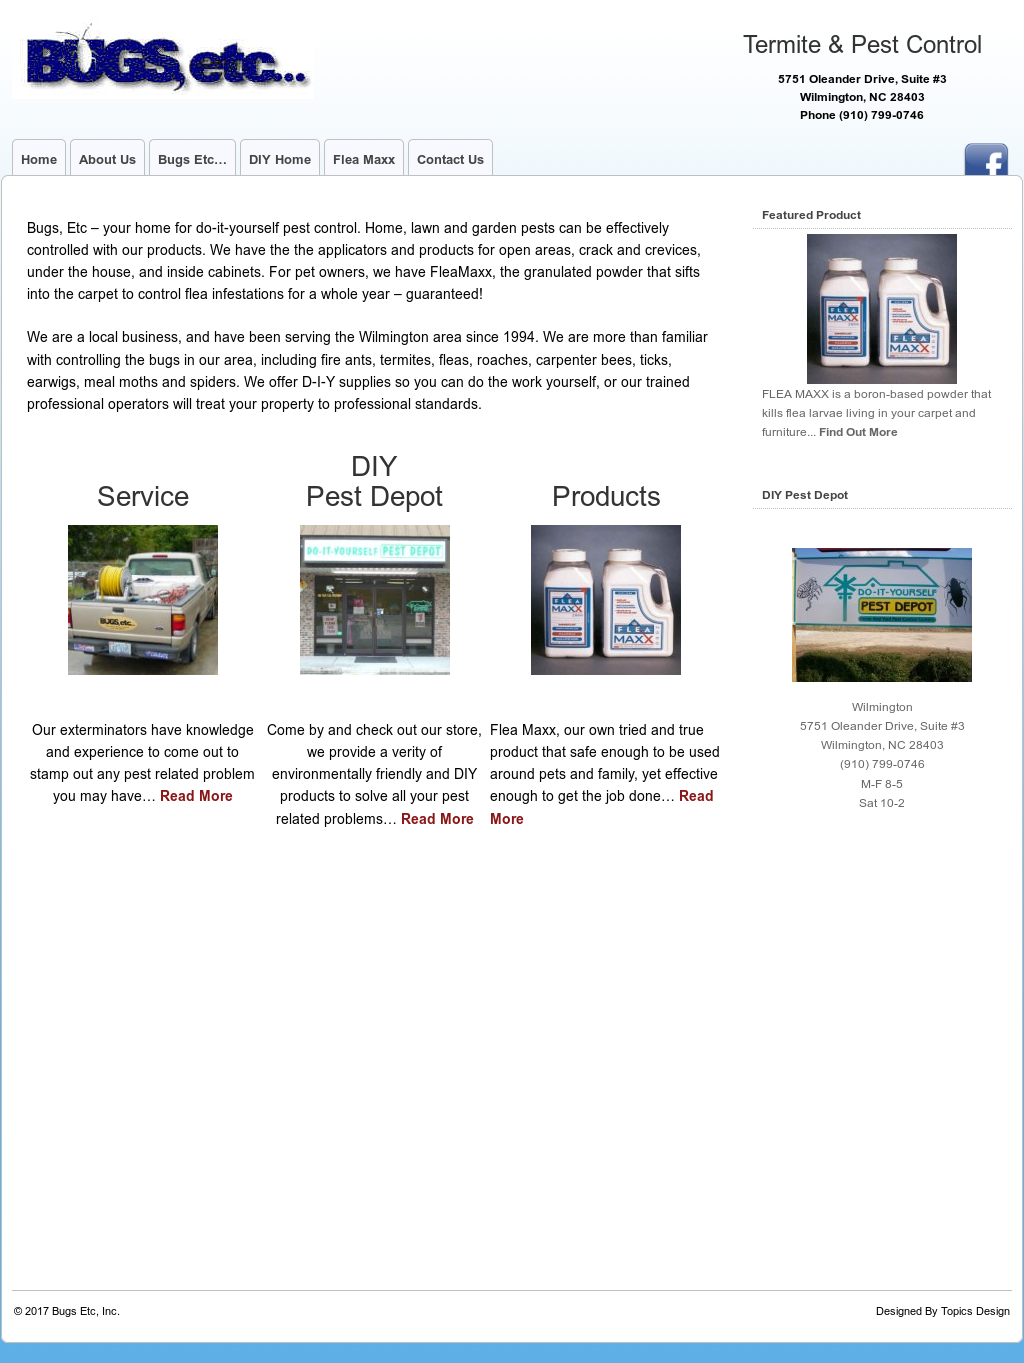 Do it yourself pest depot wilmington nc competitors revenue and do it yourself pest depot wilmington nc website history solutioingenieria Choice Image